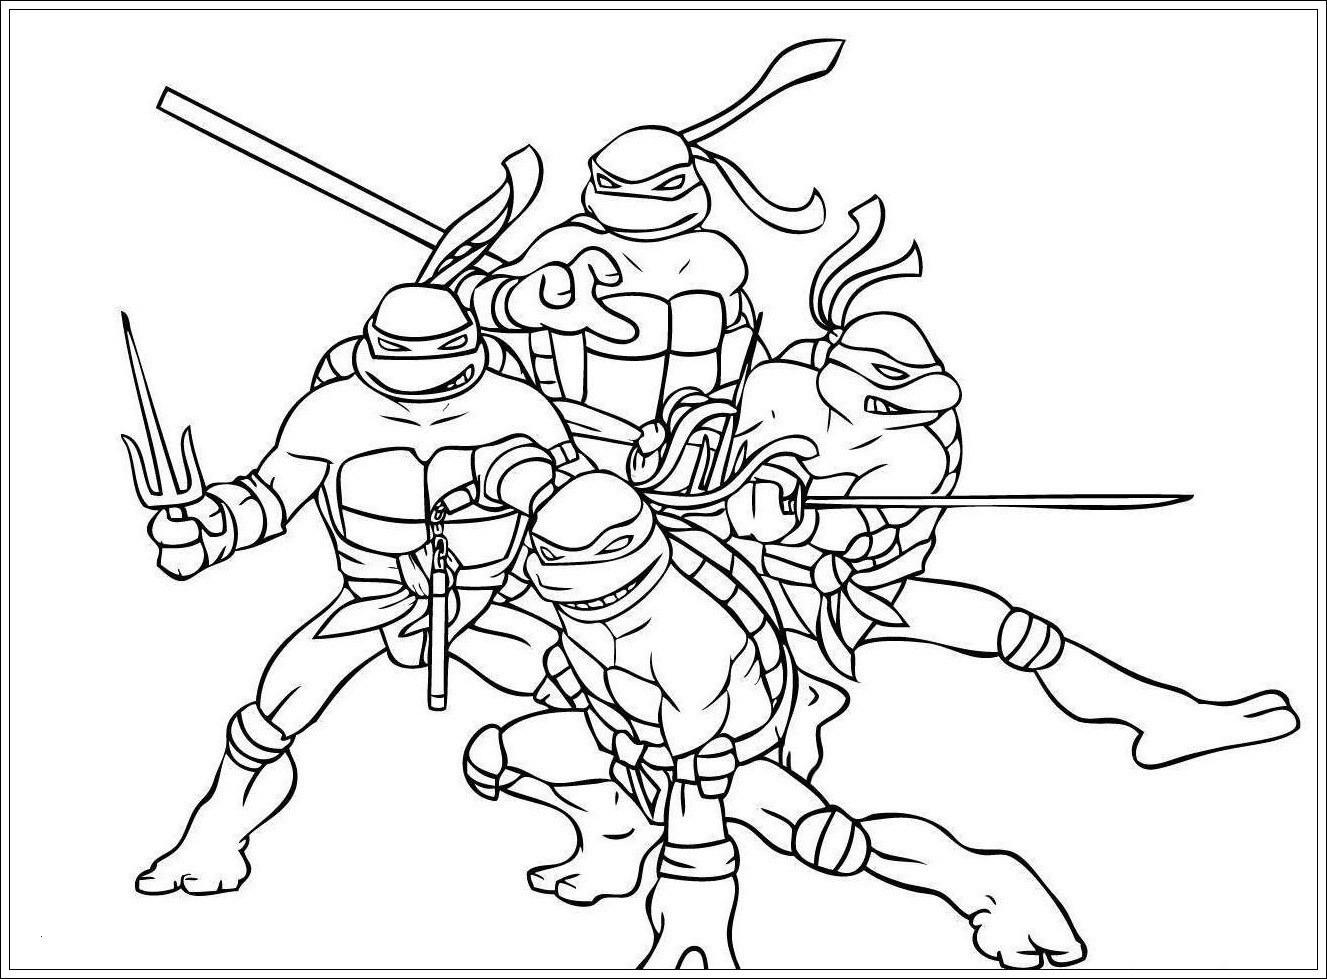 Ausmalbilder Von Ninjago Genial Ninjago Cole Ausmalbilder Inspirational Malvorlagen Igel Stock